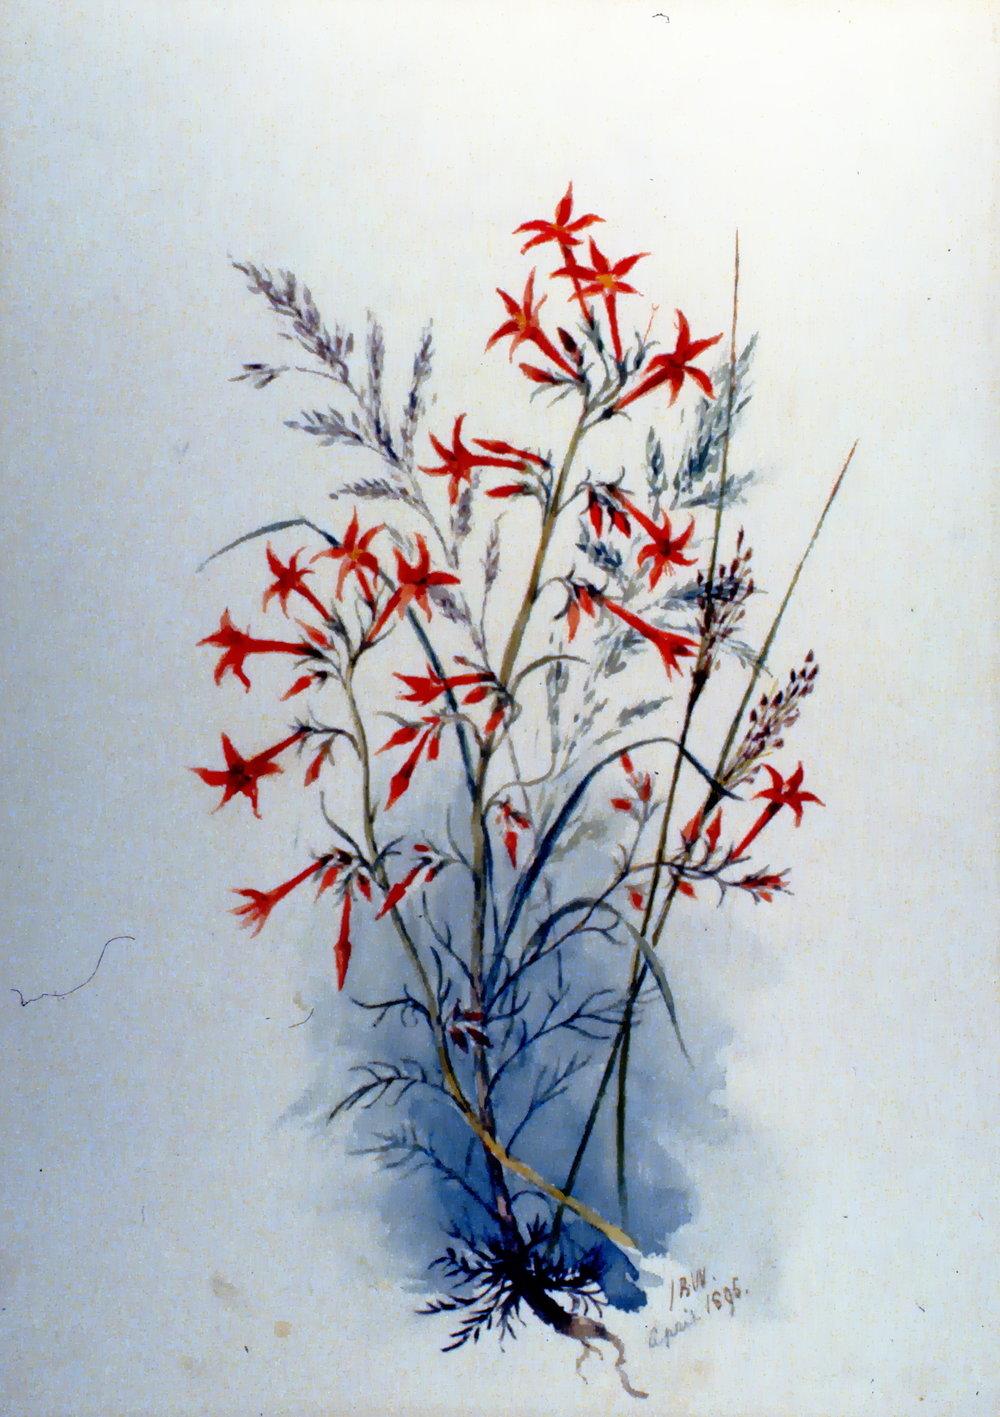 Scarlett Gilia, 1895, Julia Bullock-Webster, watercolour on paper, 35.3 x 25.2 cm, 1983.02.13. Gift of Mrs. Barbara Steel.